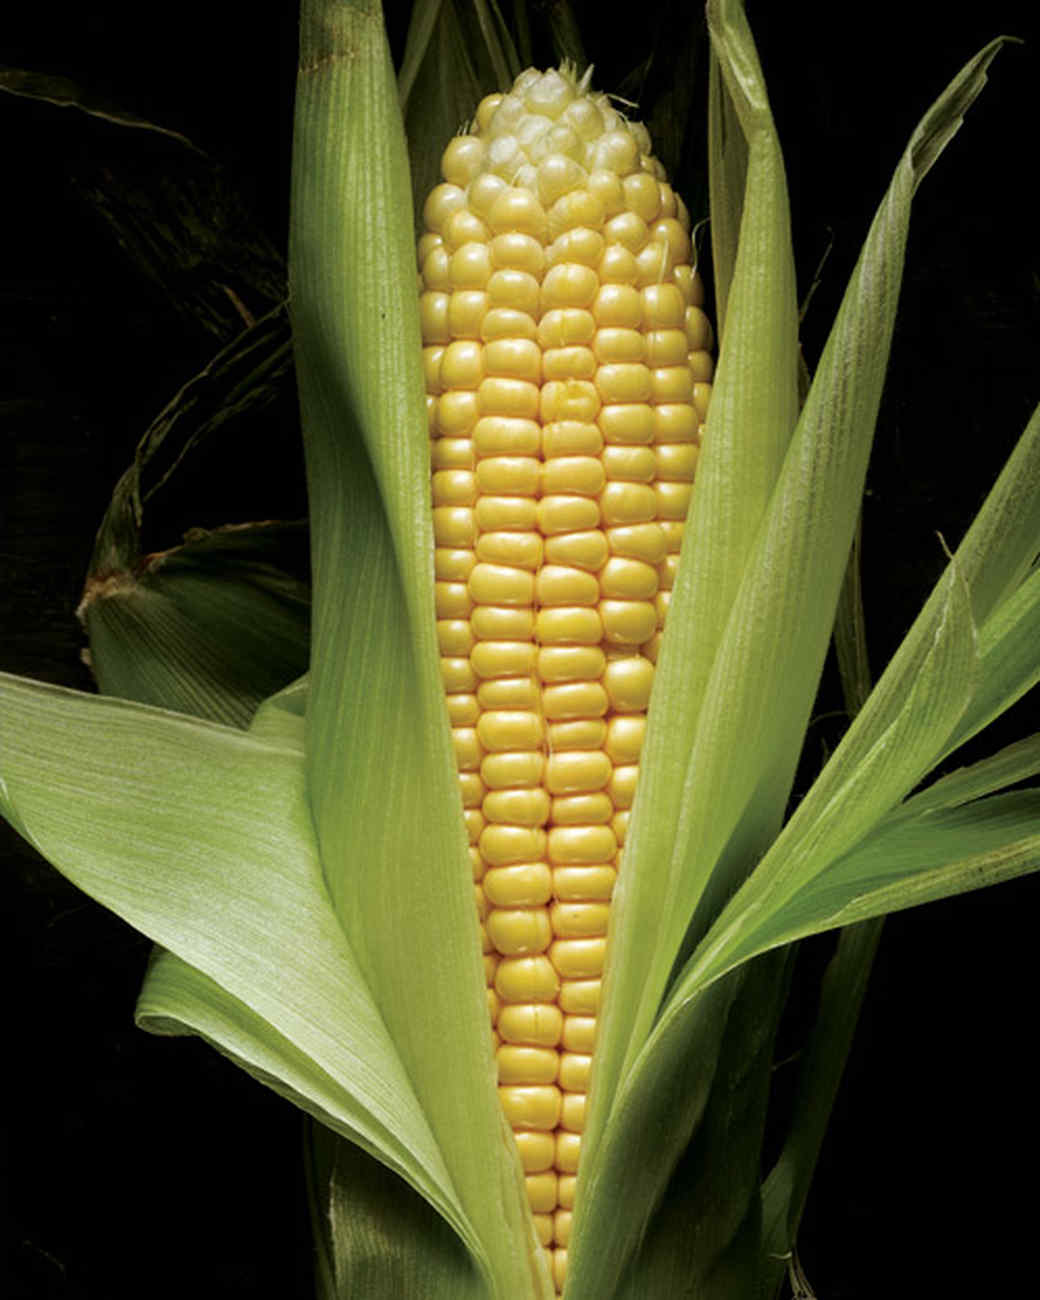 ld101342msl_0705_corn_raw.jpg